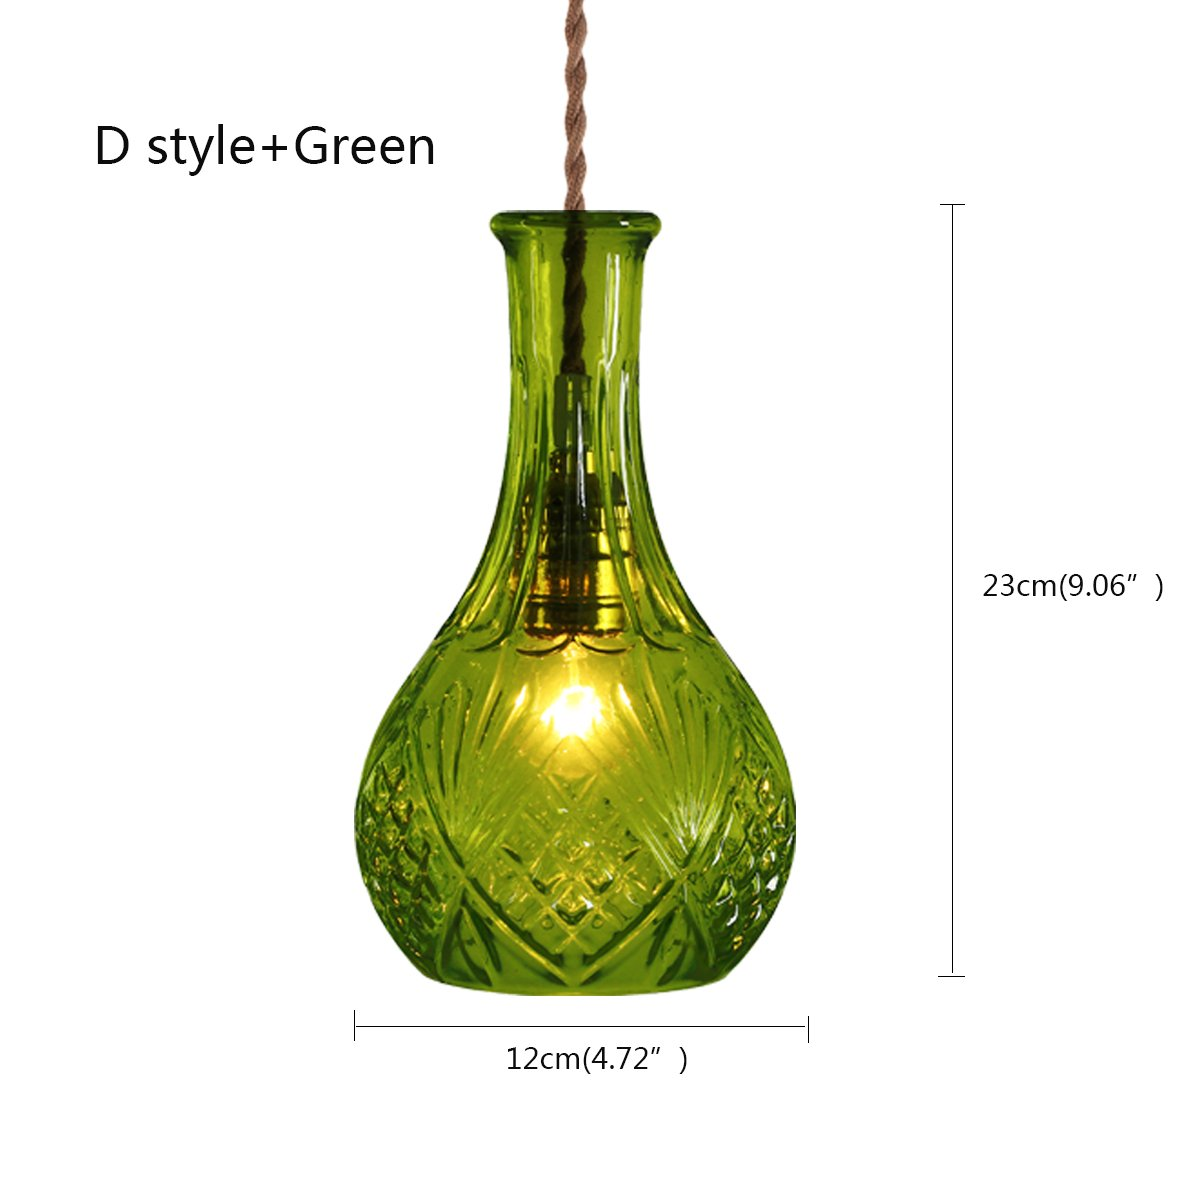 Glass Pendant Light AL-86596C (Green) Creative Personality, Retro Lighting, American Cafe, bar, bar, Clothing Store, Coloured Glass Bottle, Chandelier